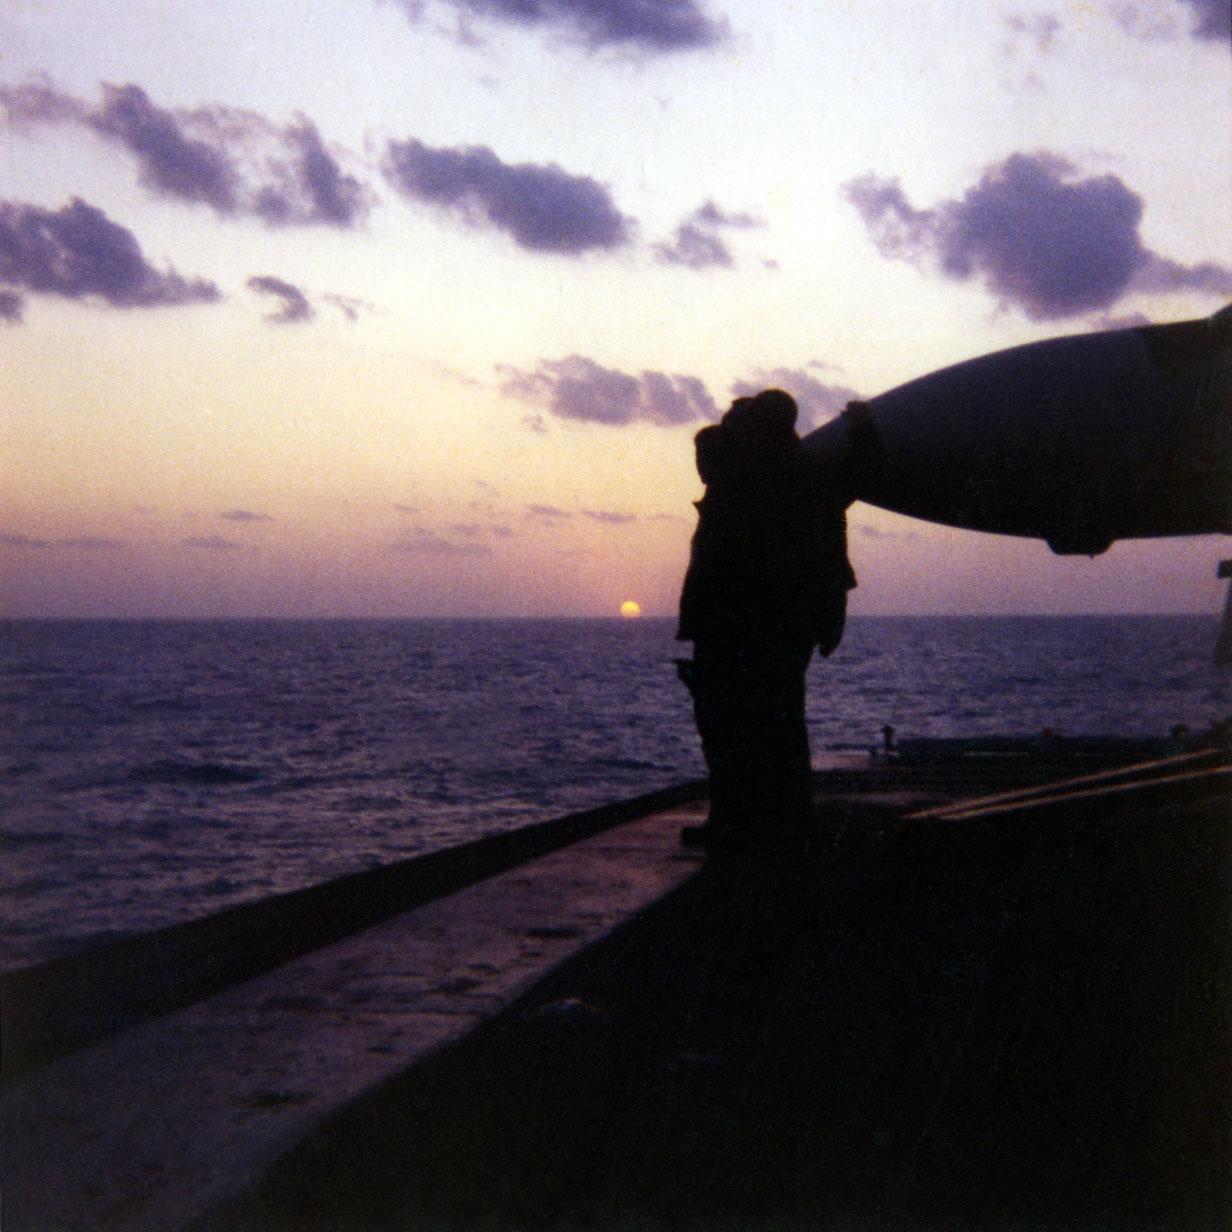 05-sunset-at-sea02-w